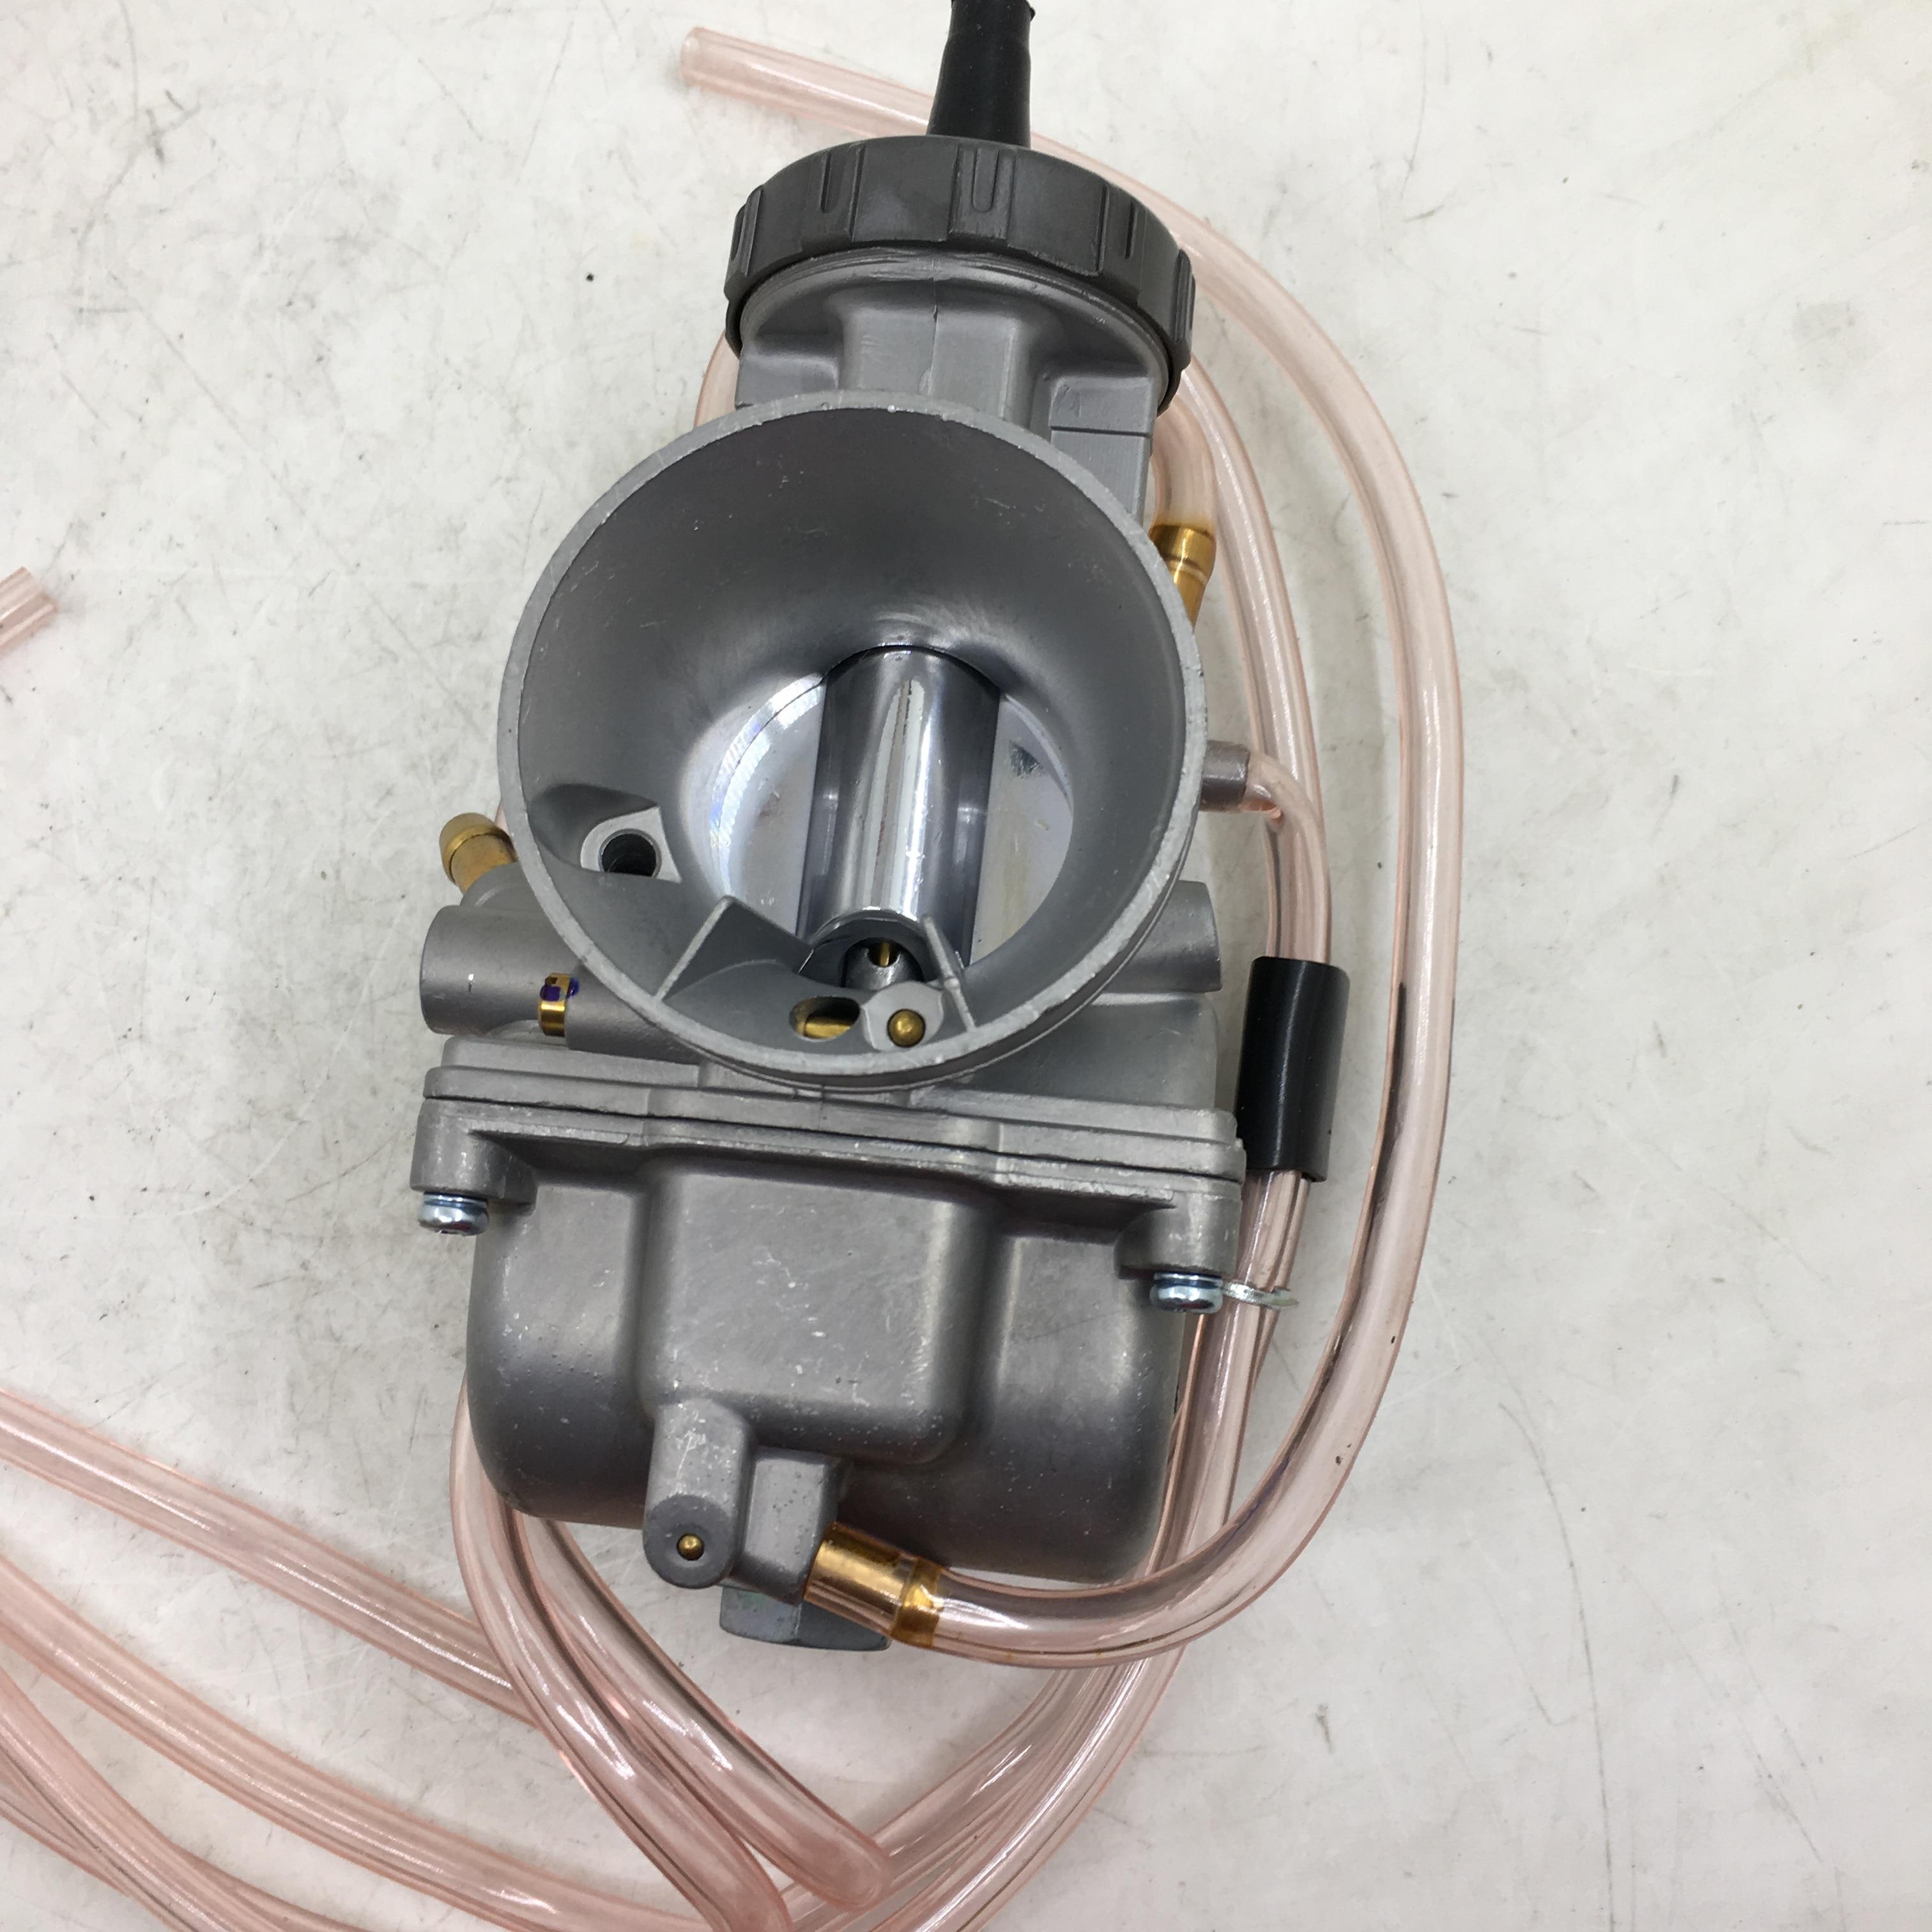 SherryBerg Carburettor 40mm Motorcycle PWK 40 Mm Carburetor 40pwk 40 Air Strike Carb For Keihin 500cc - 800cc New Top Quality